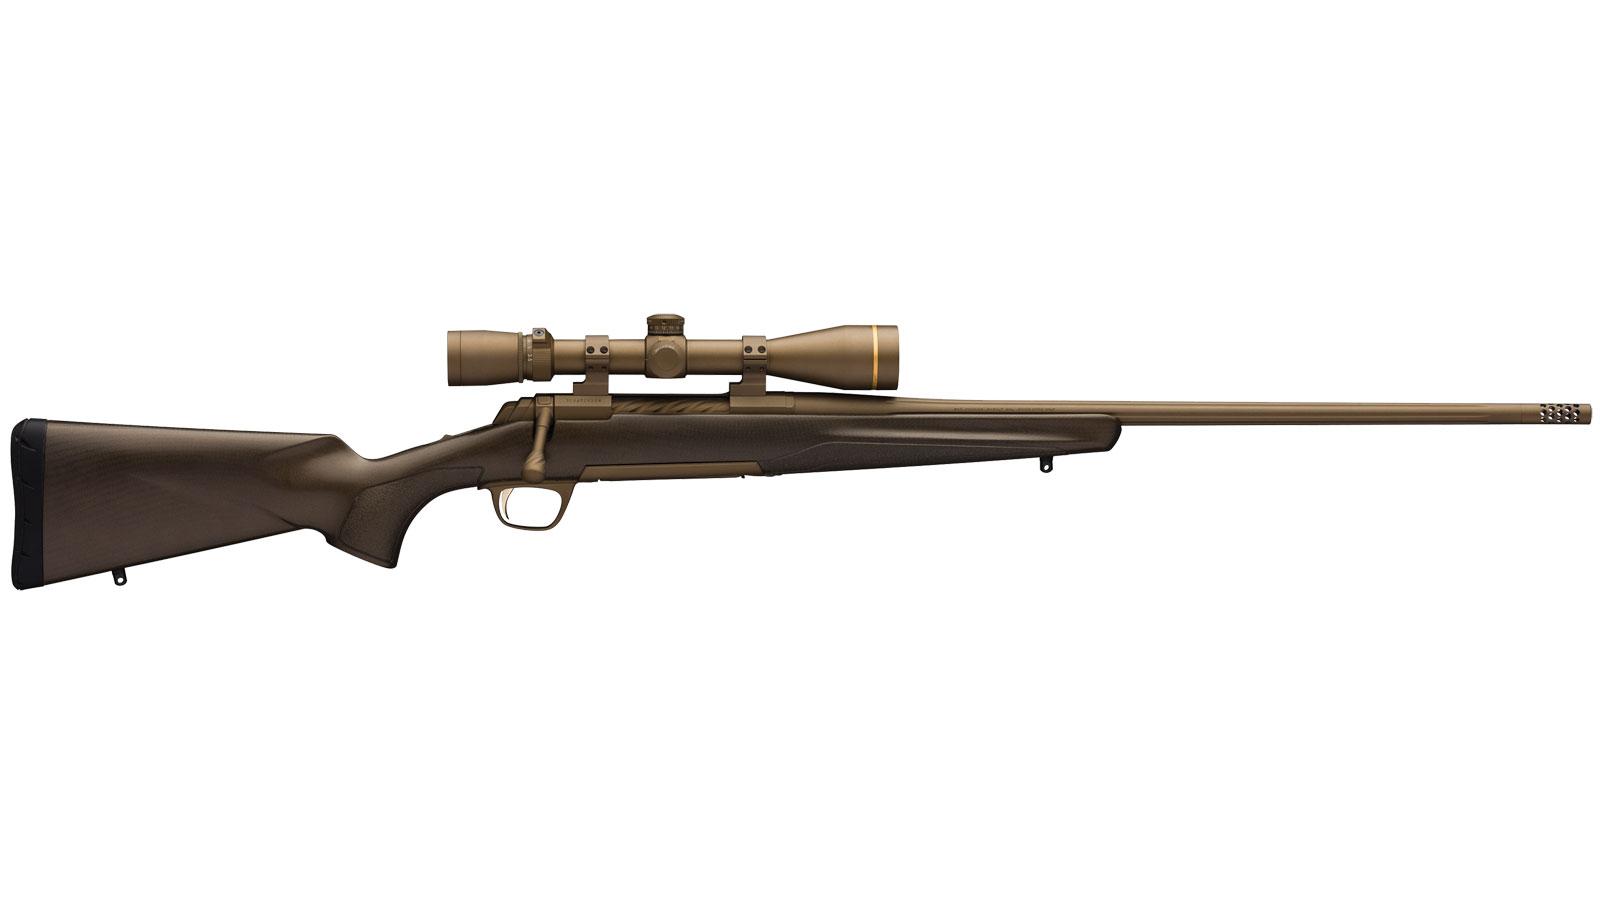 Browning 035418218 X-Bolt Pro Bolt 308 Winchester 7.62 NATO 22 3+1 Carbon Fiber Burnt Bronze Cerakote Stk Burnt Bronze Cerakote in.